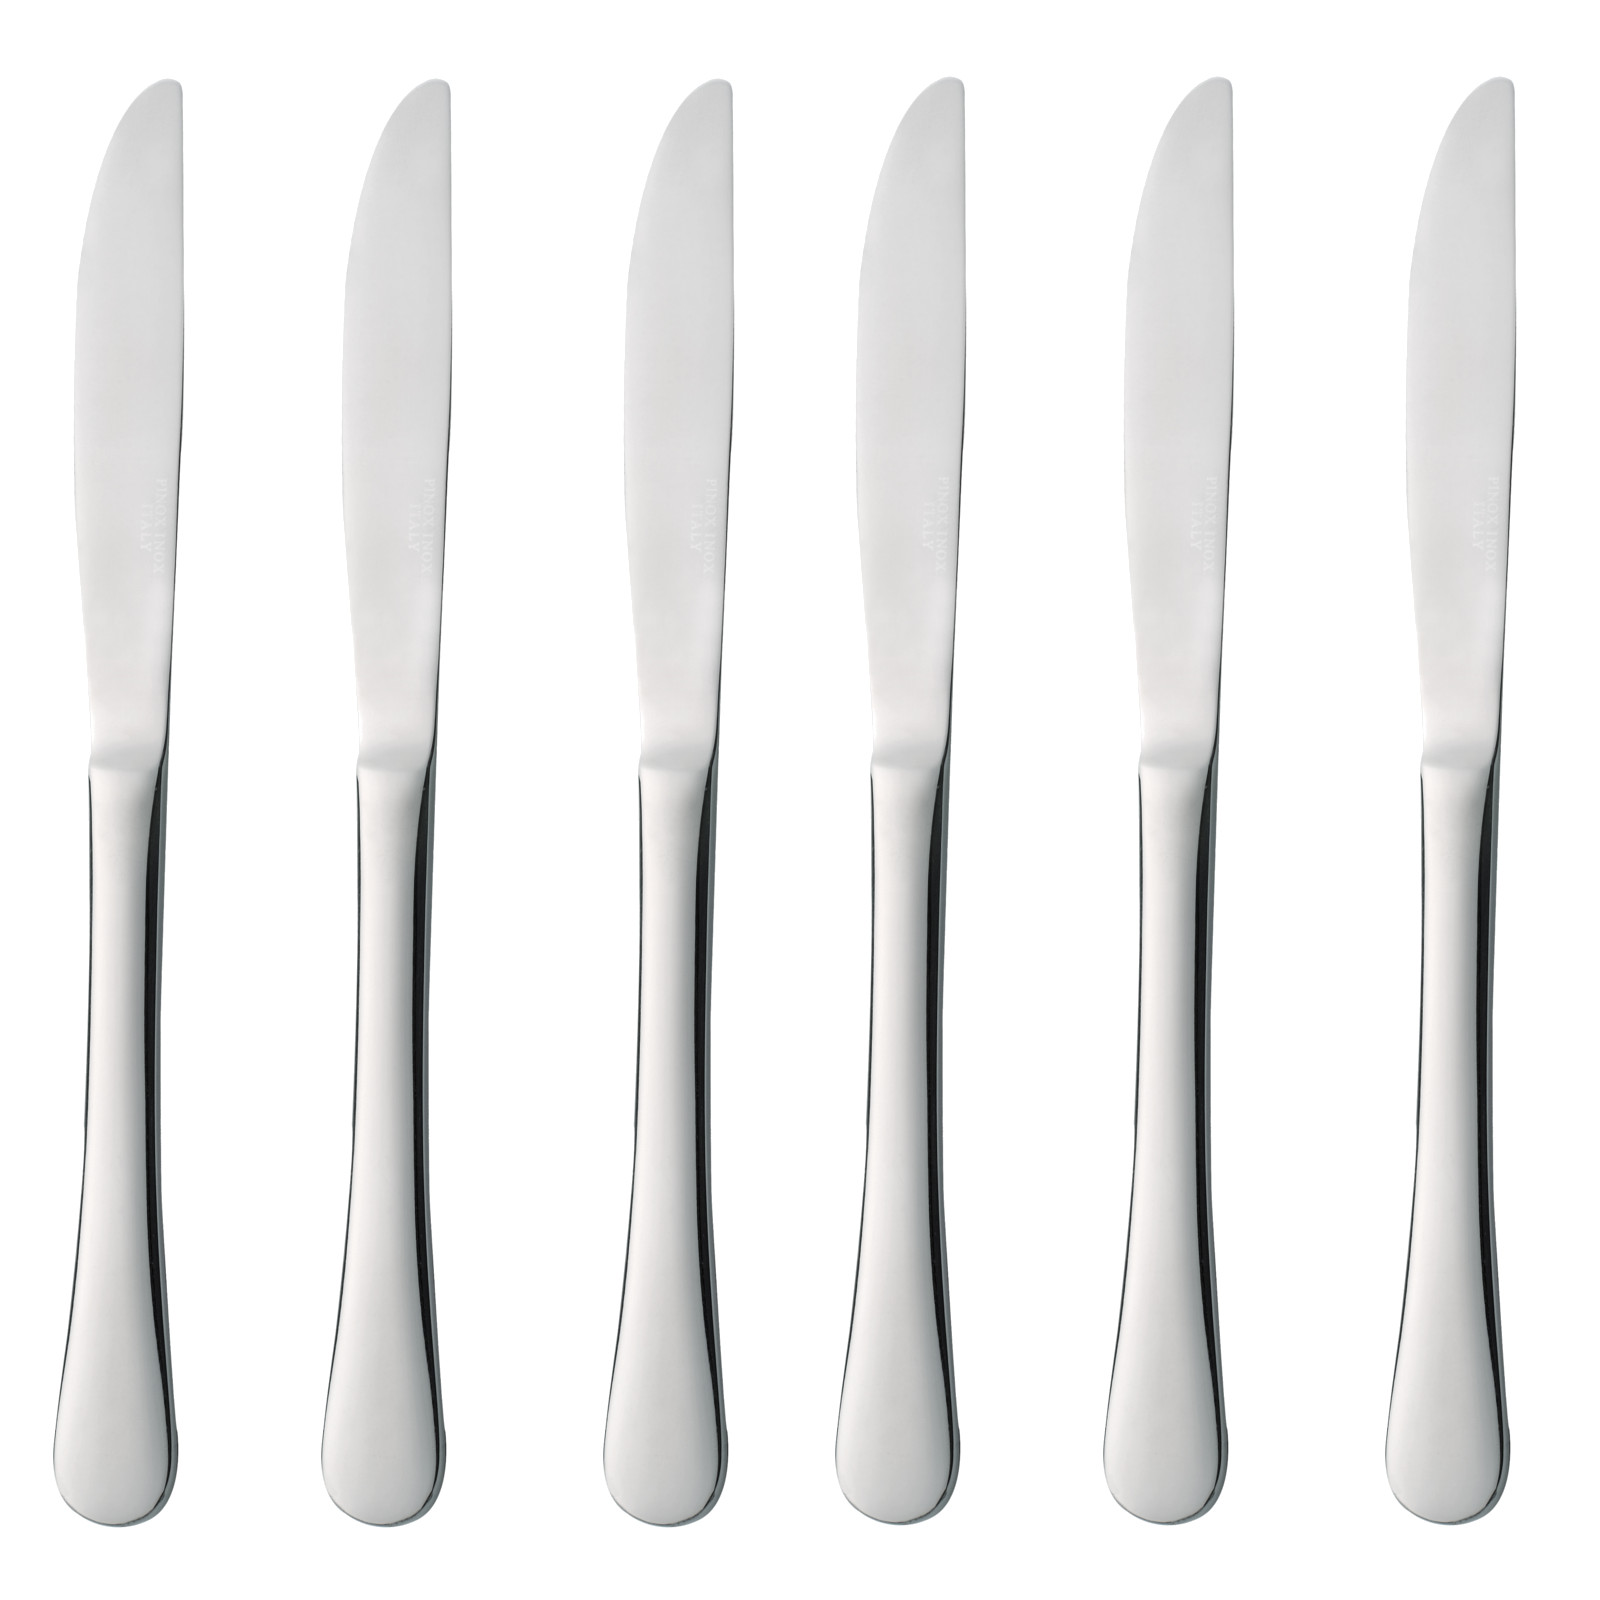 6x stolové nože Dinnerware Steel Blues Hendi